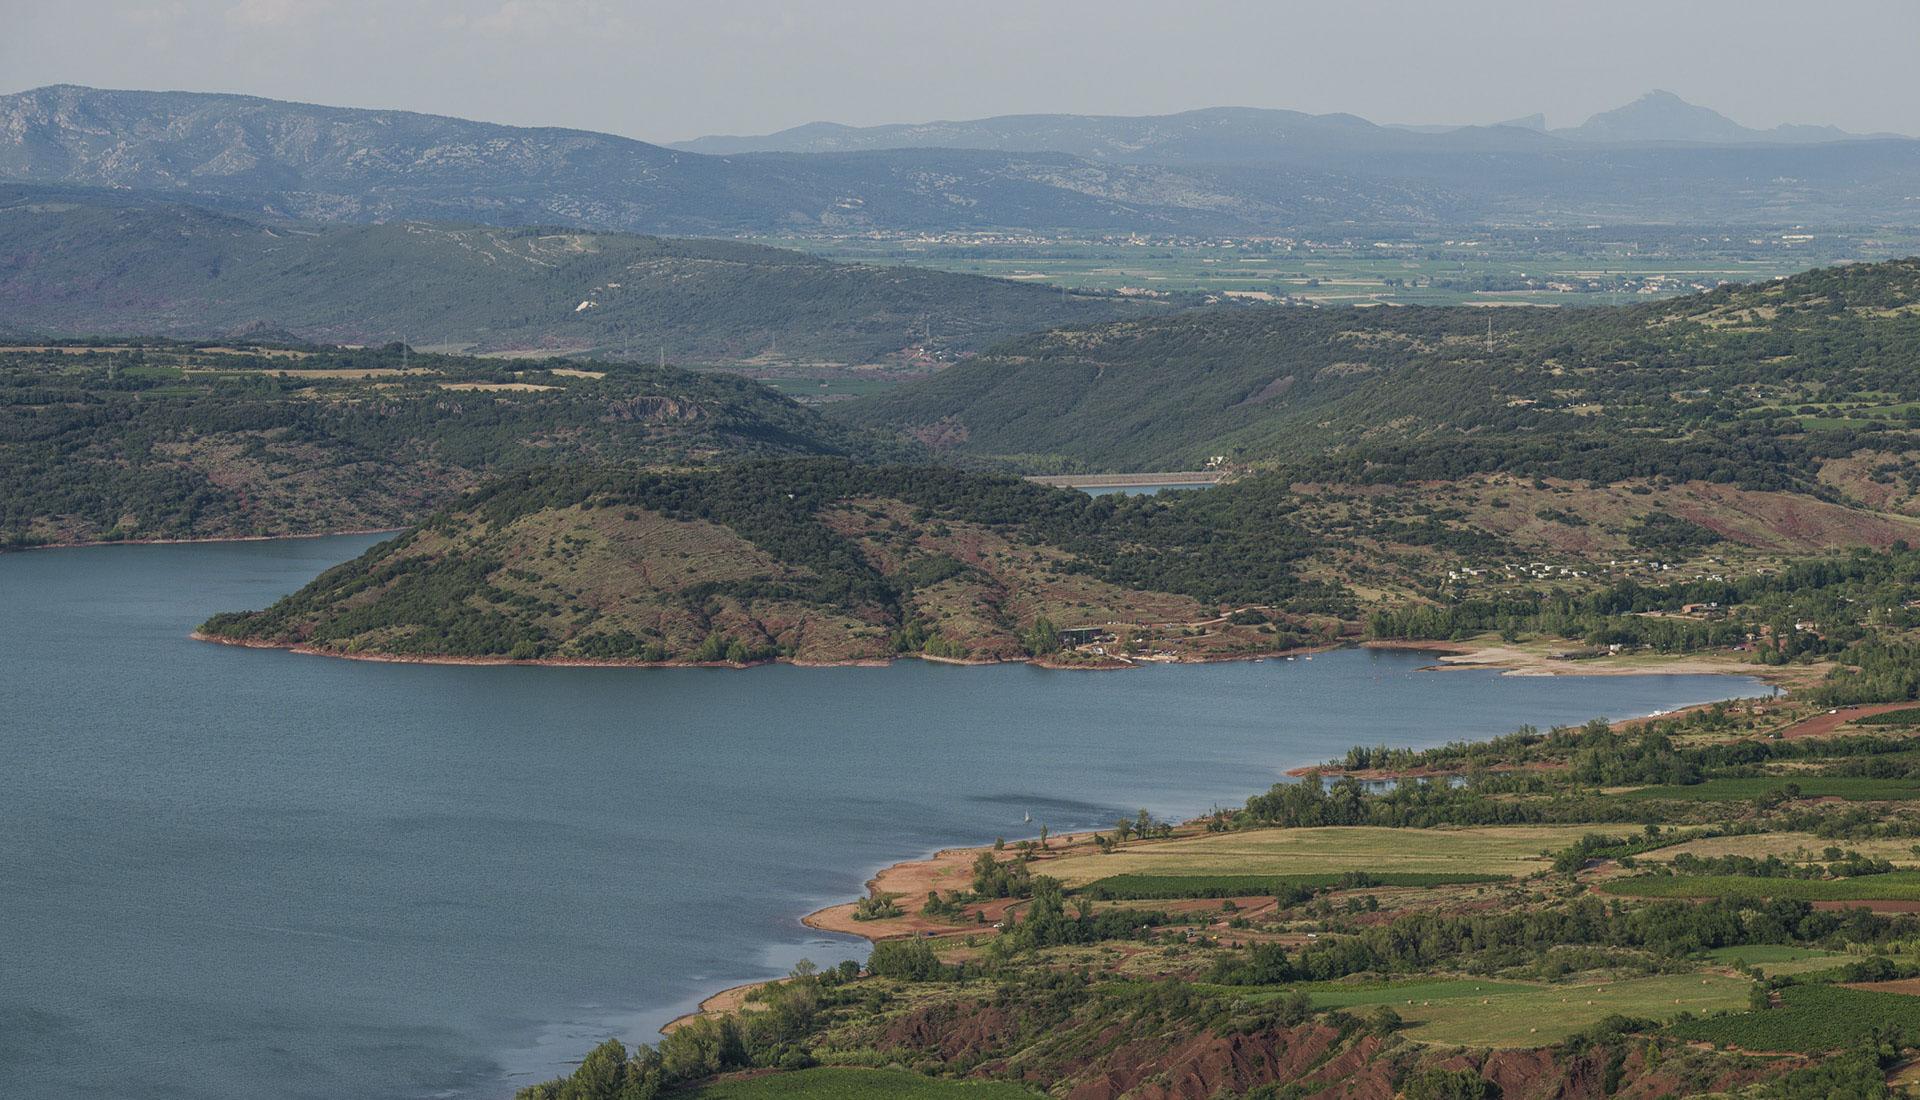 Lac du Salagou Liausson © Christian Ferrer:Wikimedia Commons